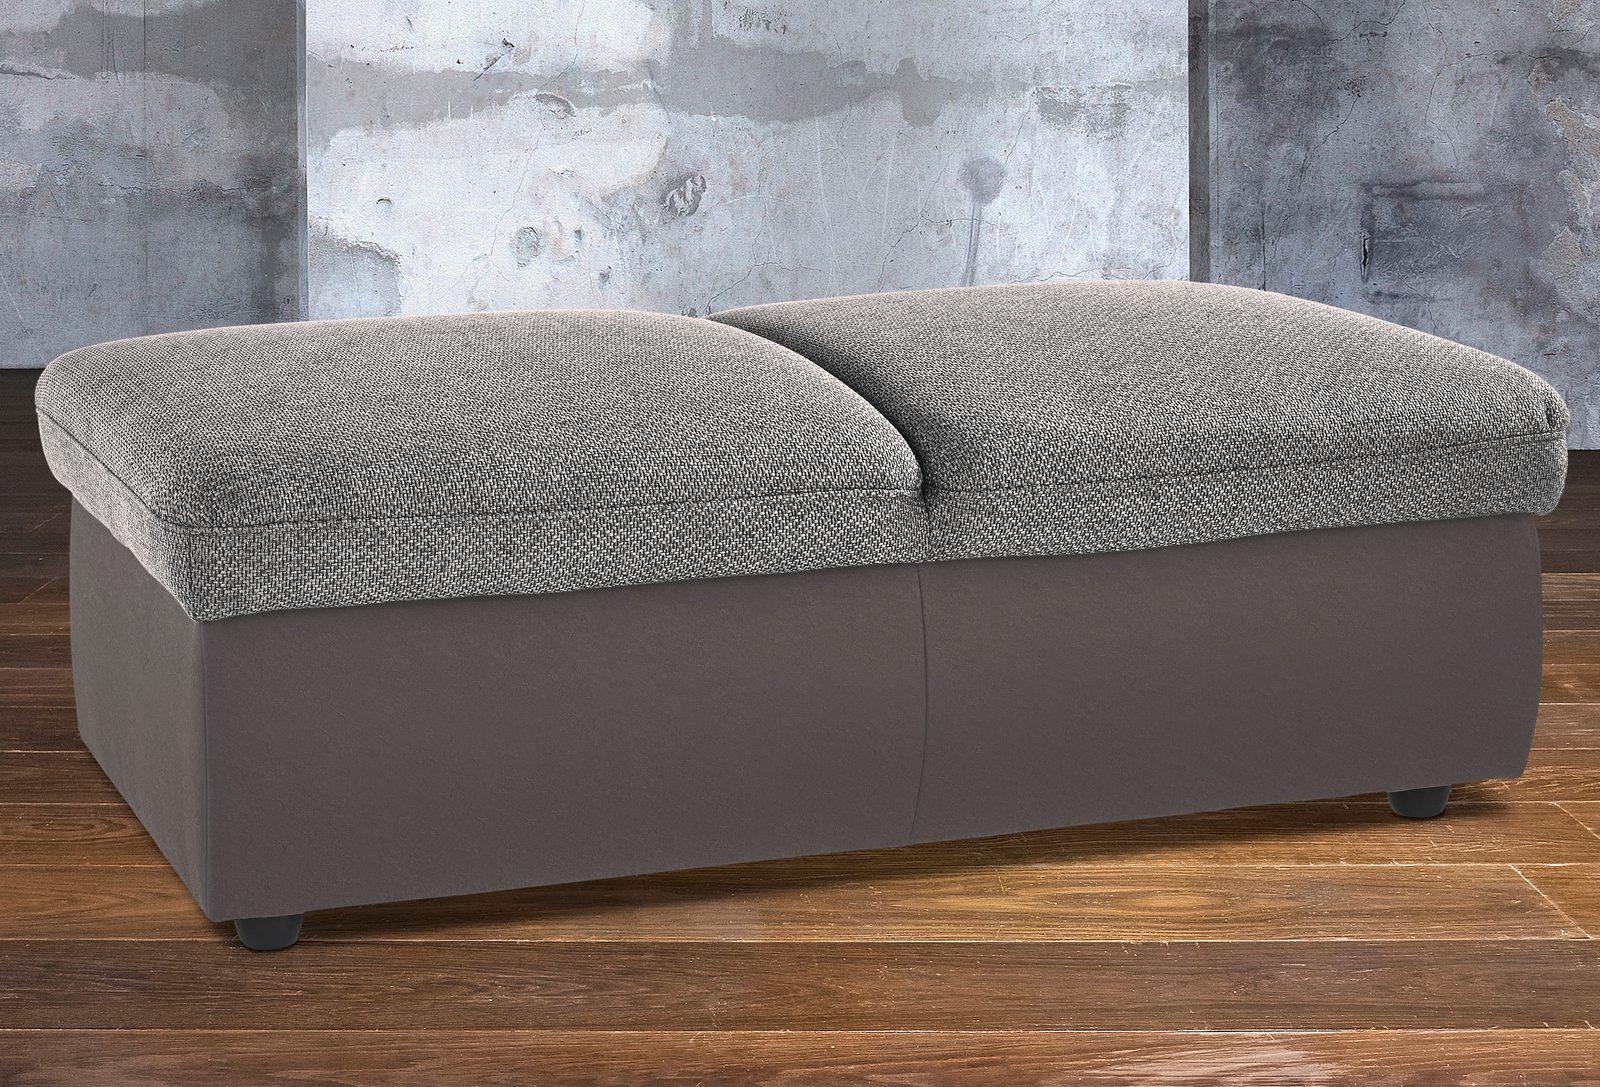 Hocker, City Sofa